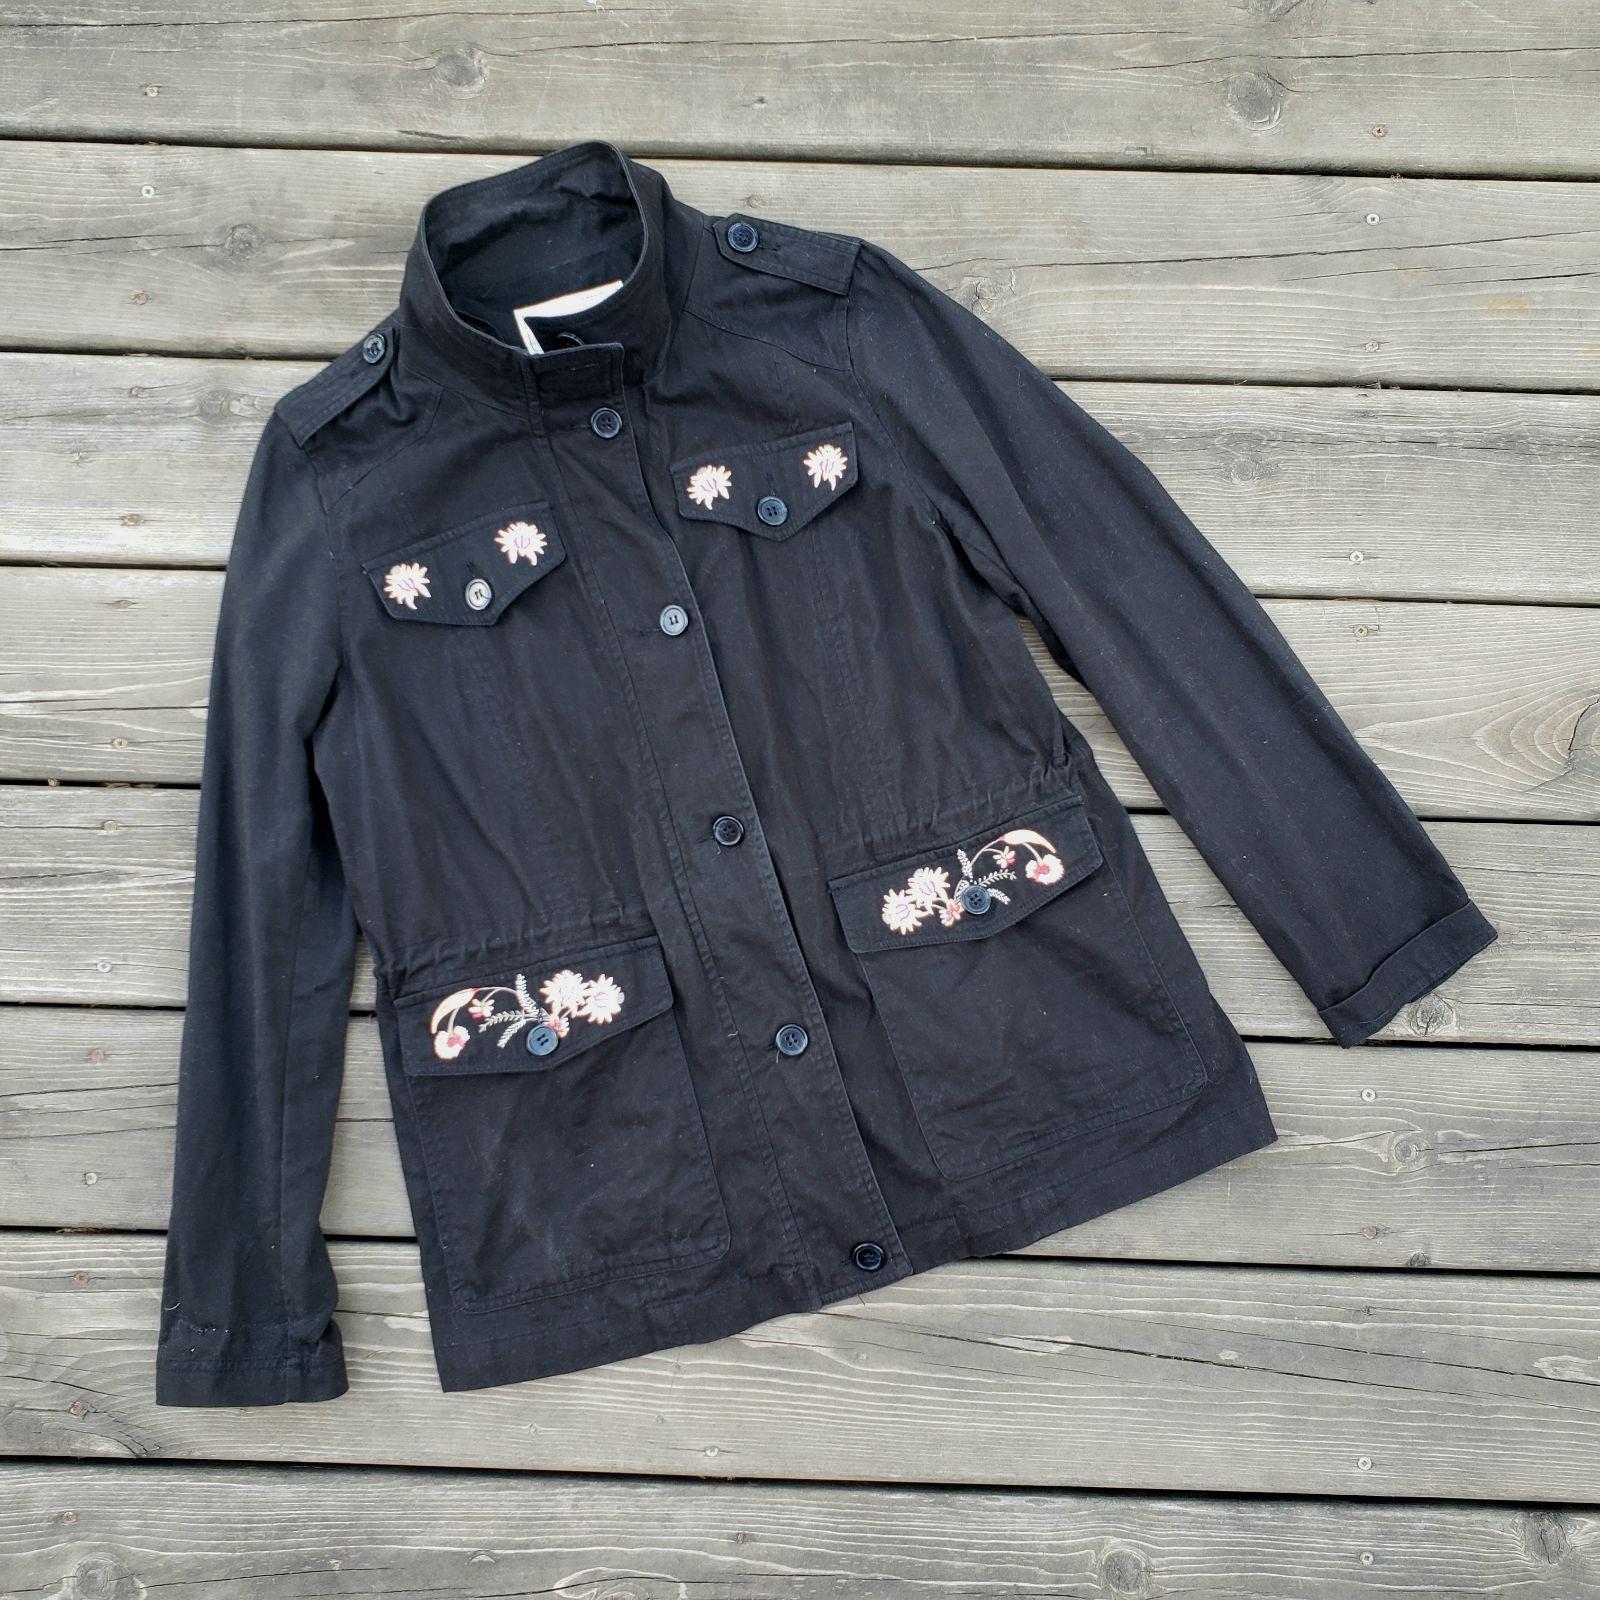 Anthropologie | Embroidered Cargo Jacket